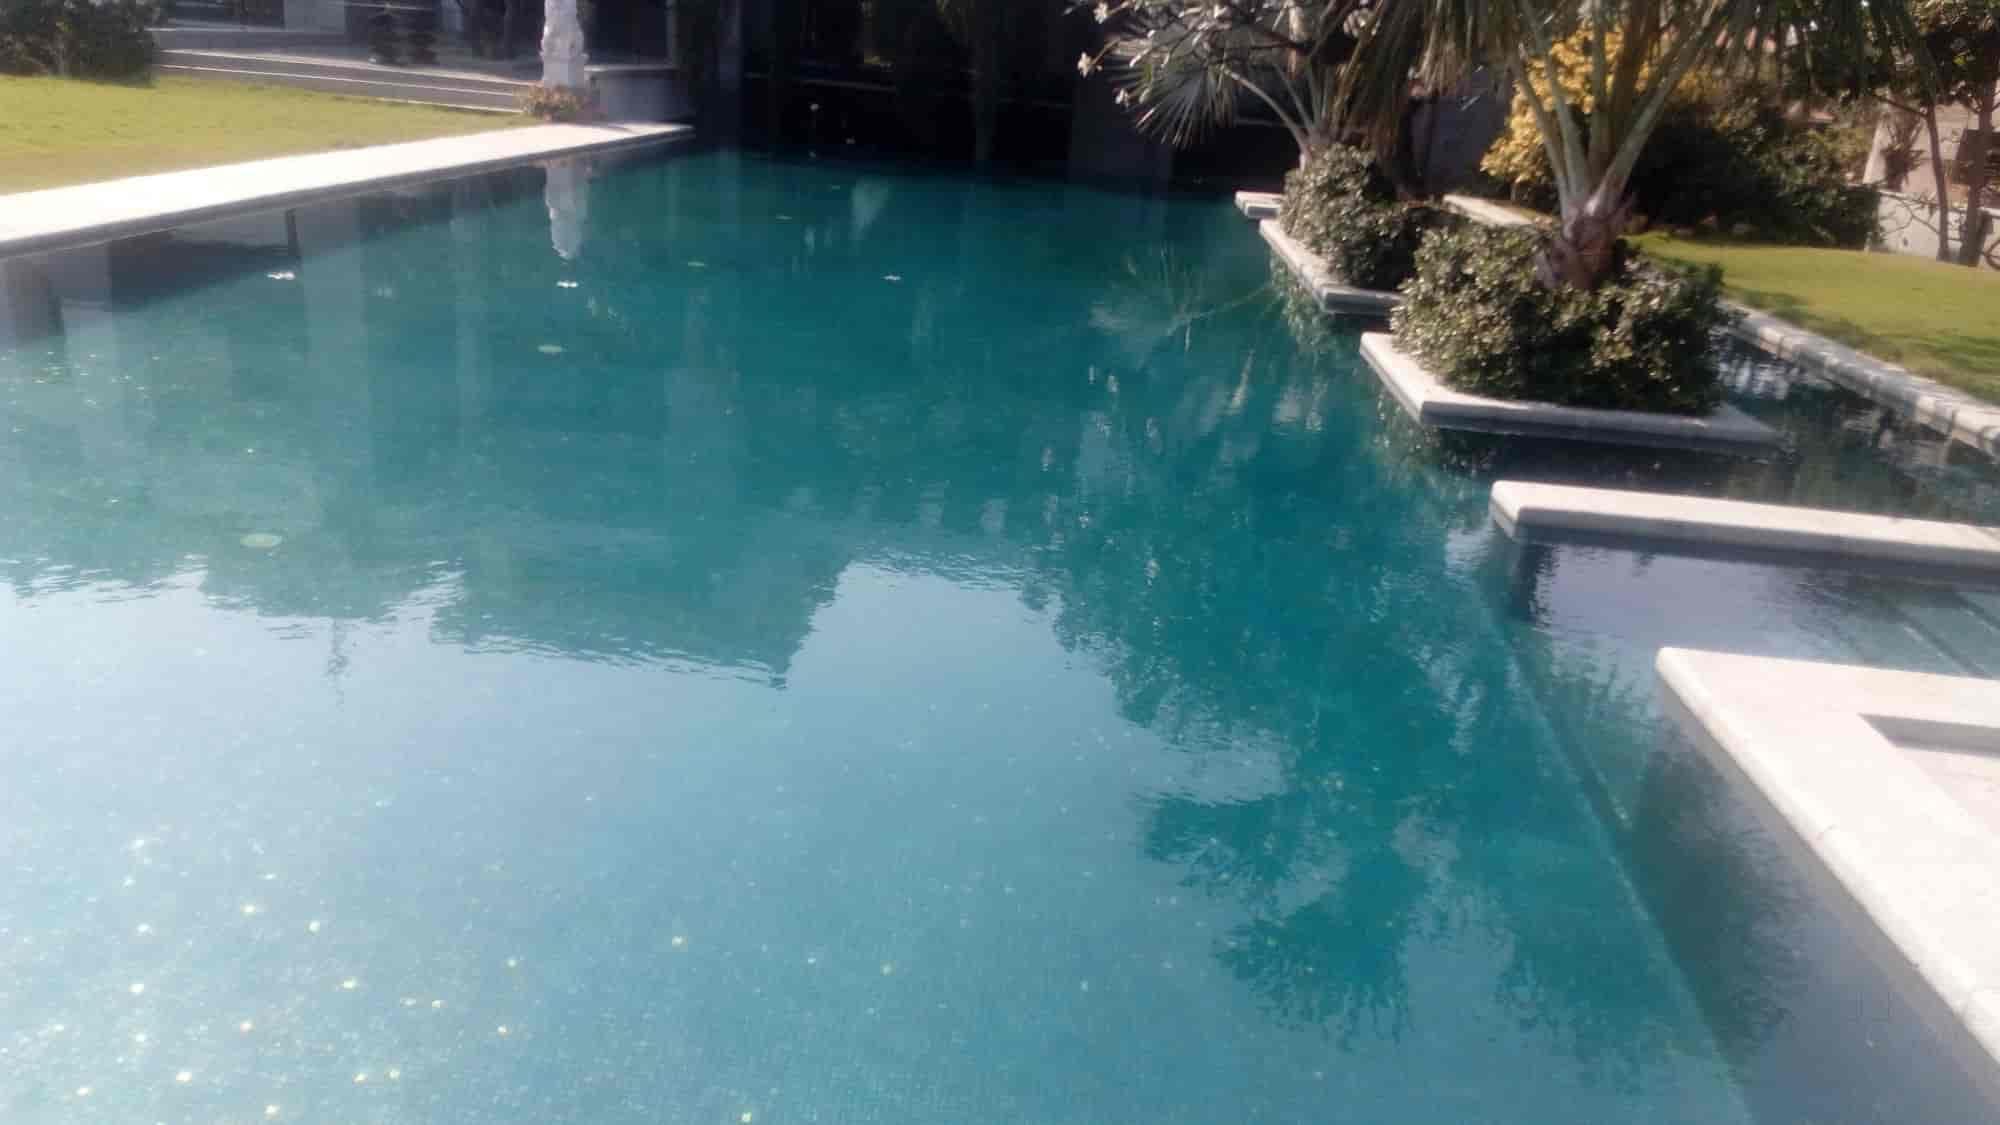 Designer Pools And Spa, Madhavaram Milk Colony   Designer Pools U0026 Spa    Swimming Pool Construction Contractors In Chennai   Justdial